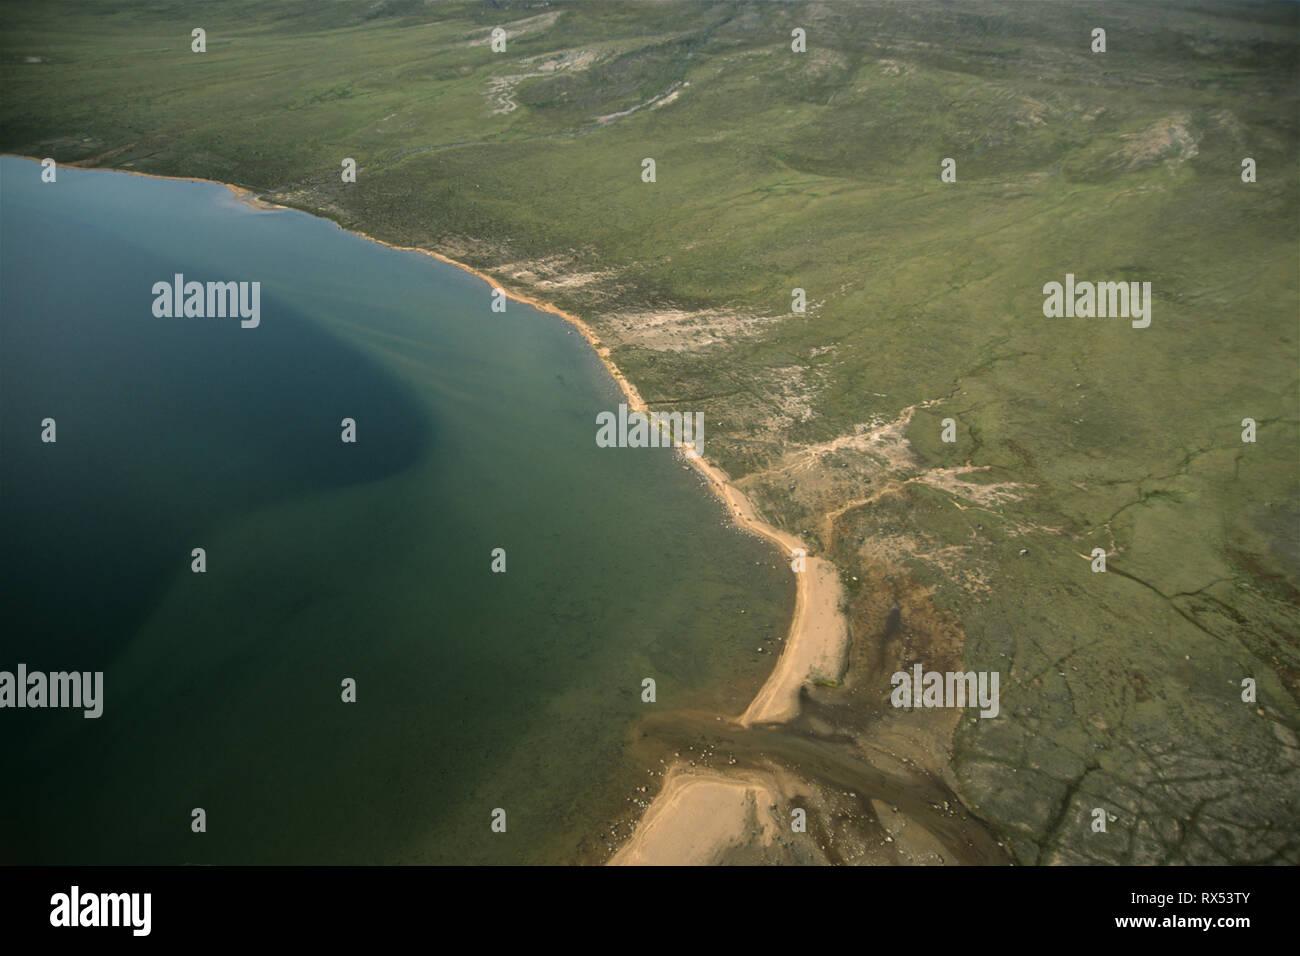 Aerial view, Ukkusiksalik National Park, Wager Bay, Nunuvut, Canada - Stock Image